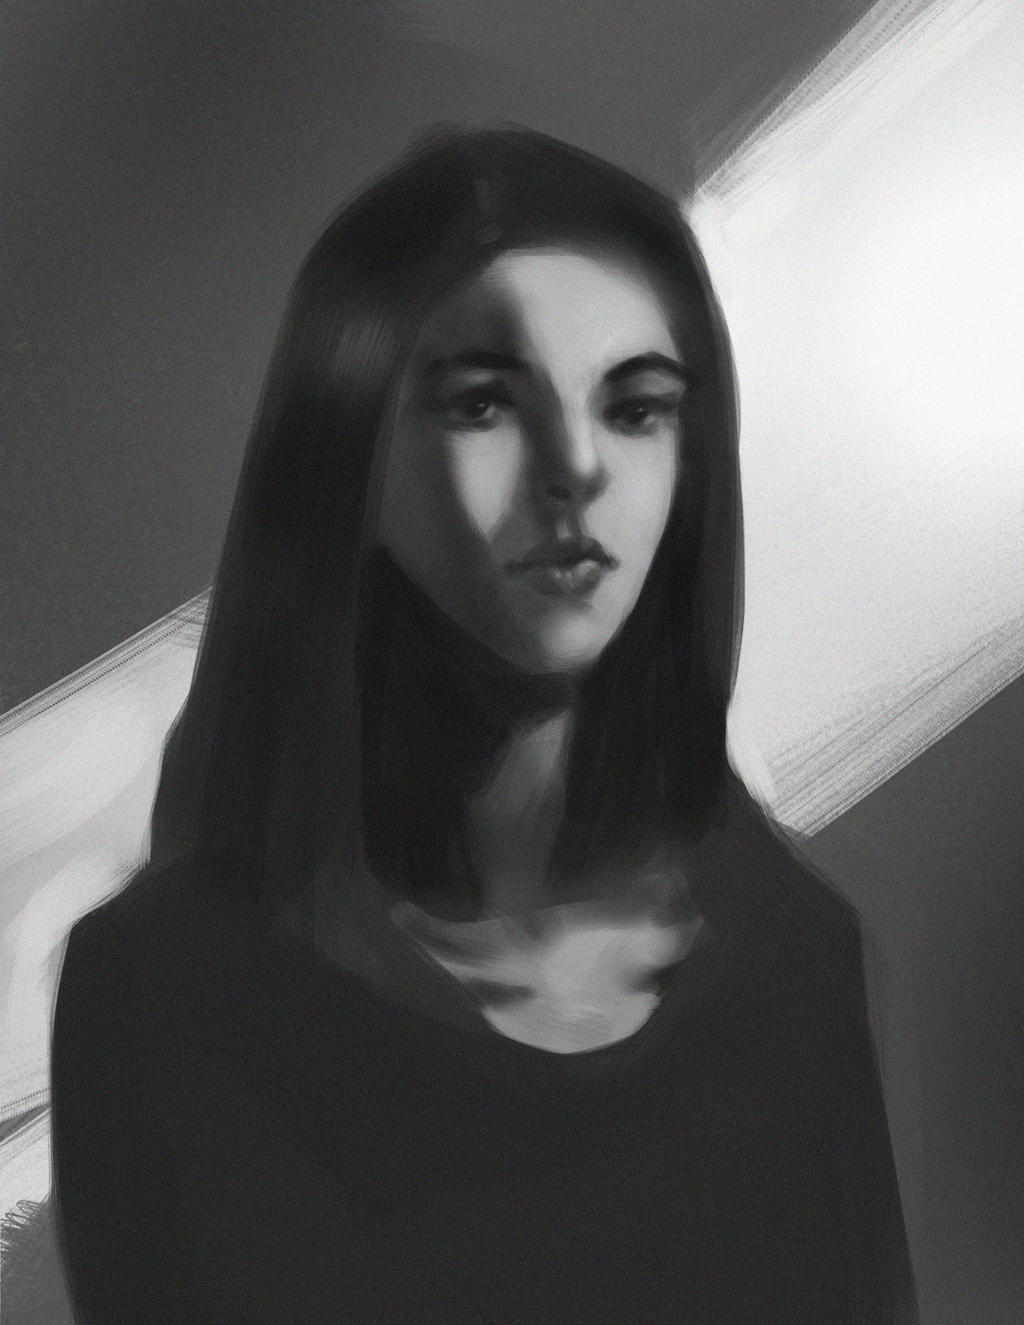 Female1 by aljonab